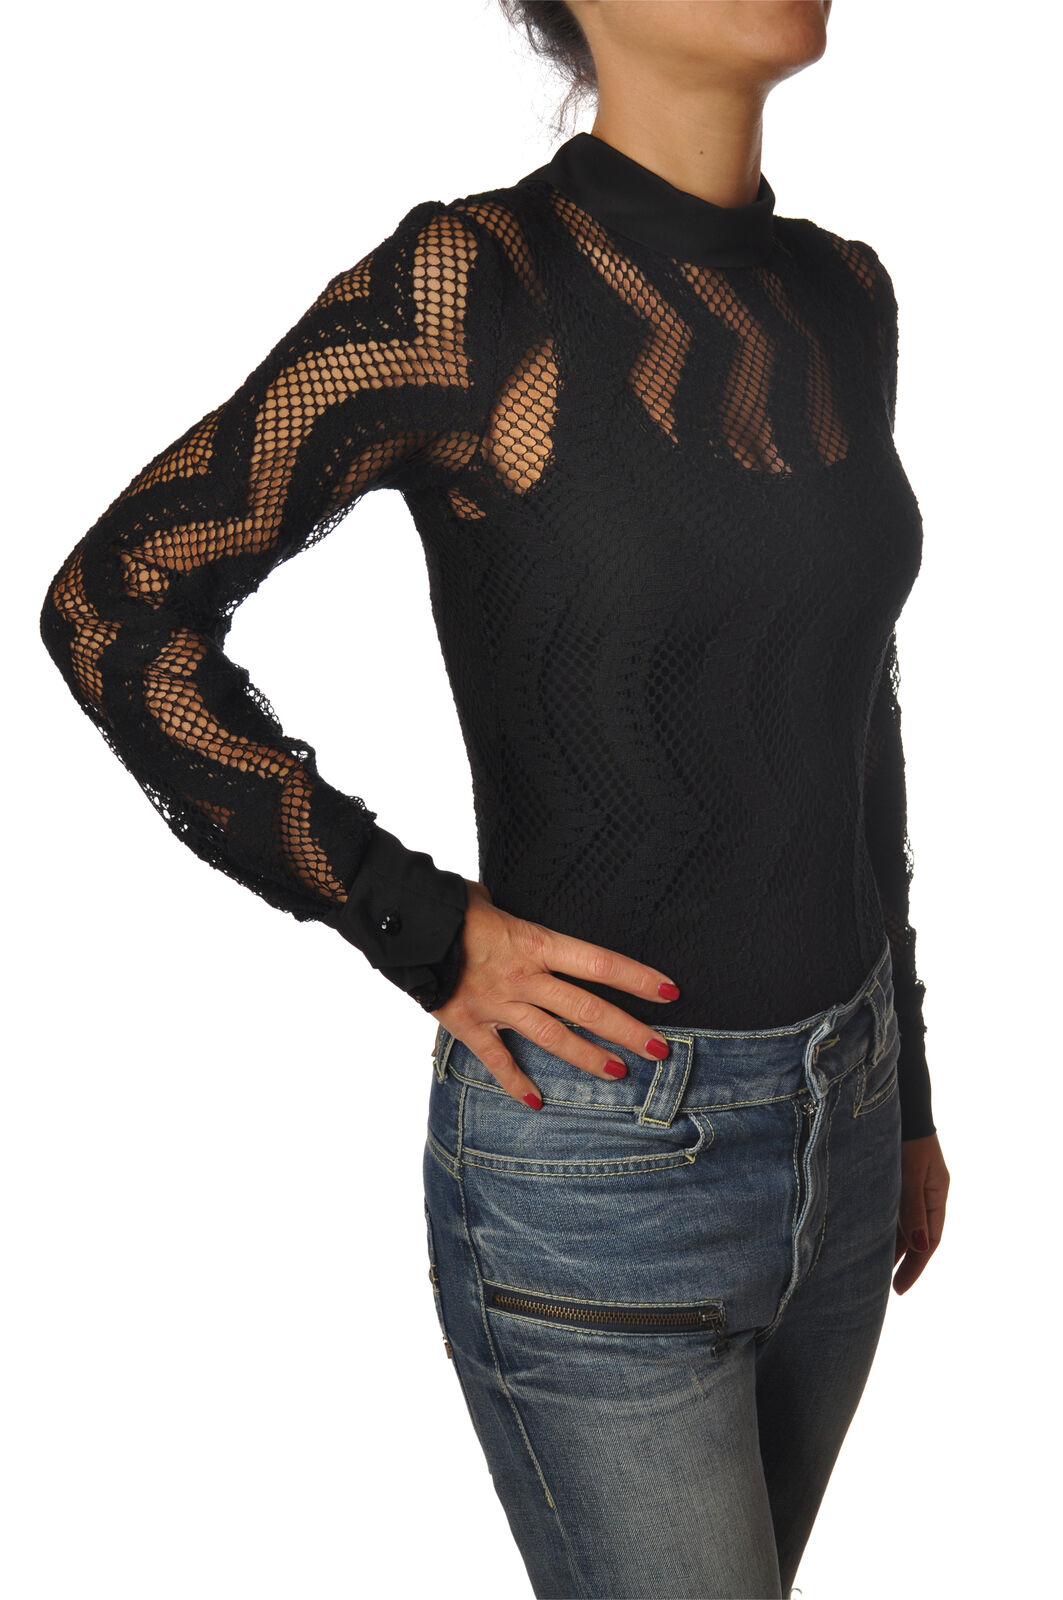 Rame - Shirts-Shirts - Woman - schwarz - 5730809E190656